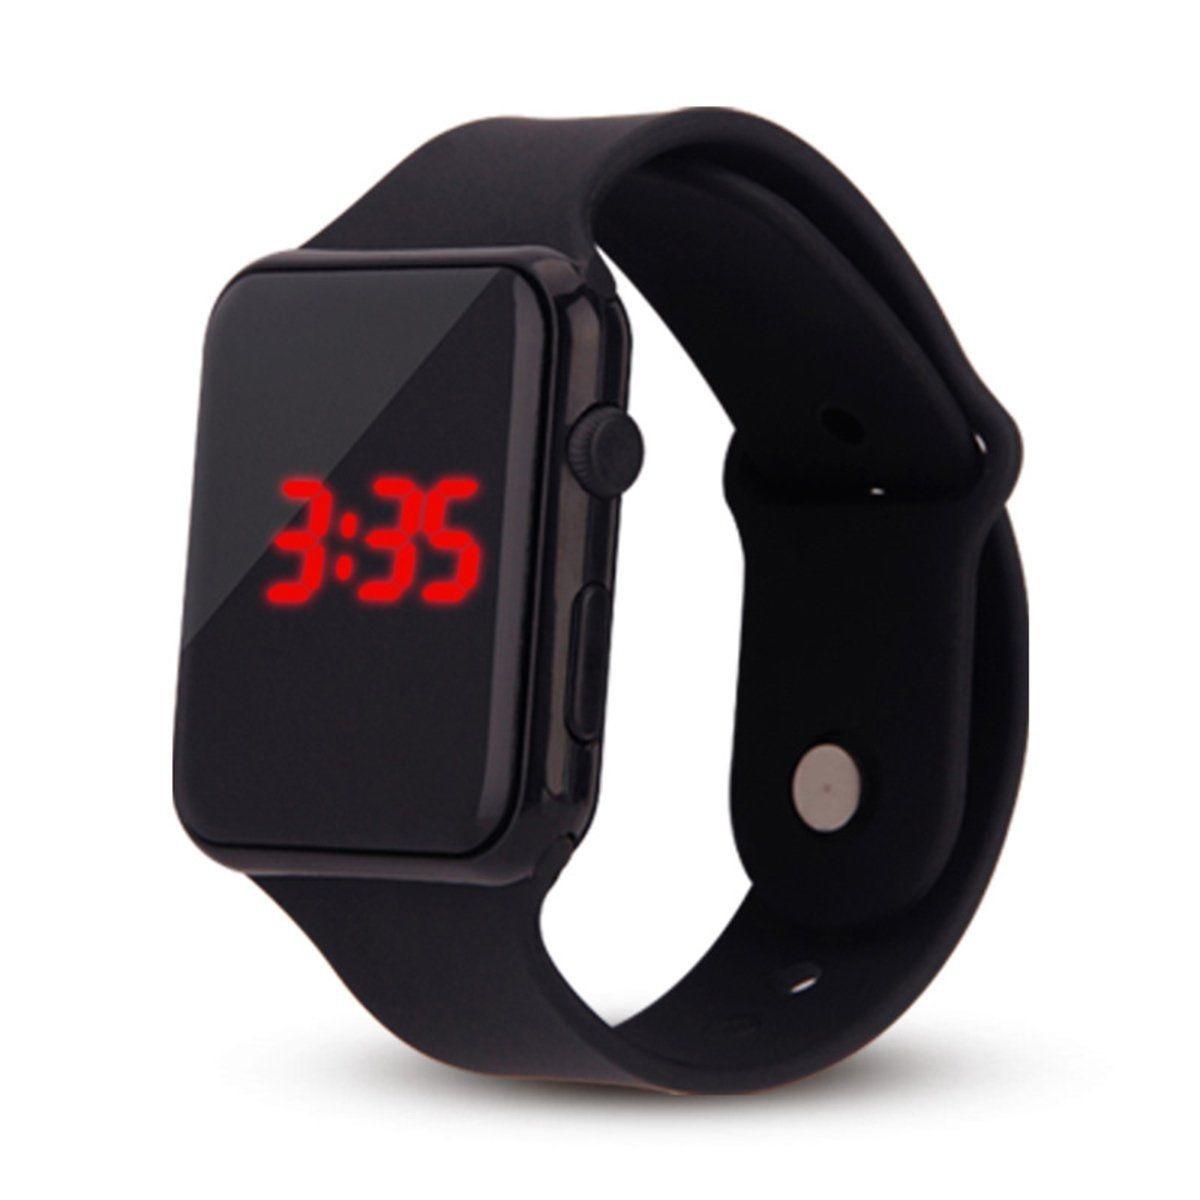 Unisex Digital LED Sports Watch Silicone Band Wrist Watches Men Children Fashion Sport Watch Electronic Digital Watch Gifts Men'